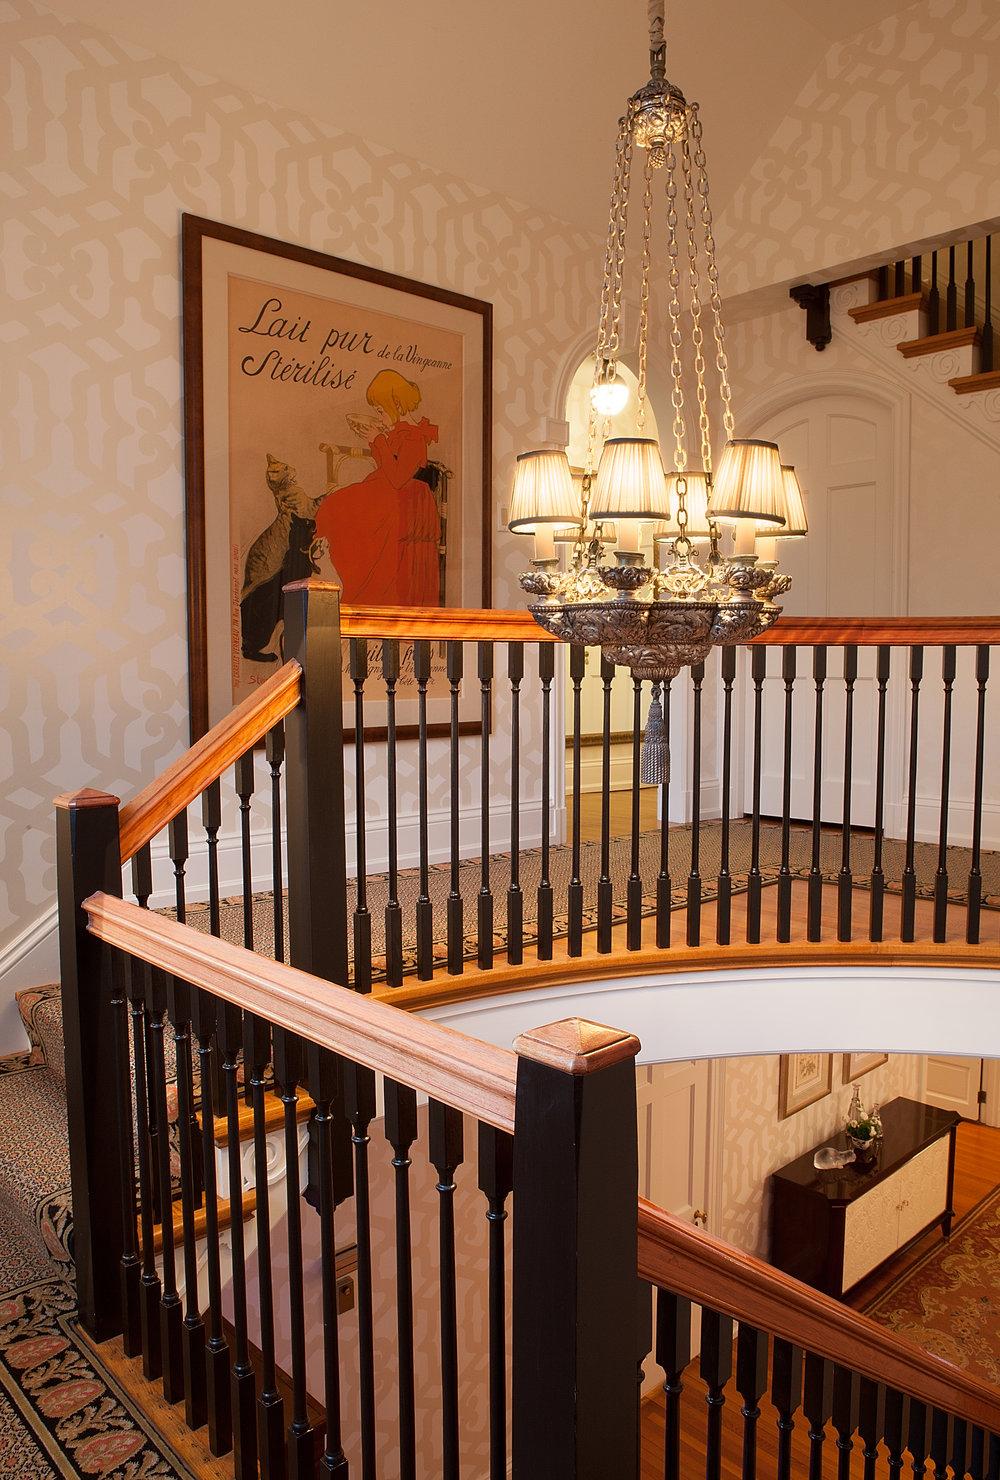 brooks_staircase_1.jpg